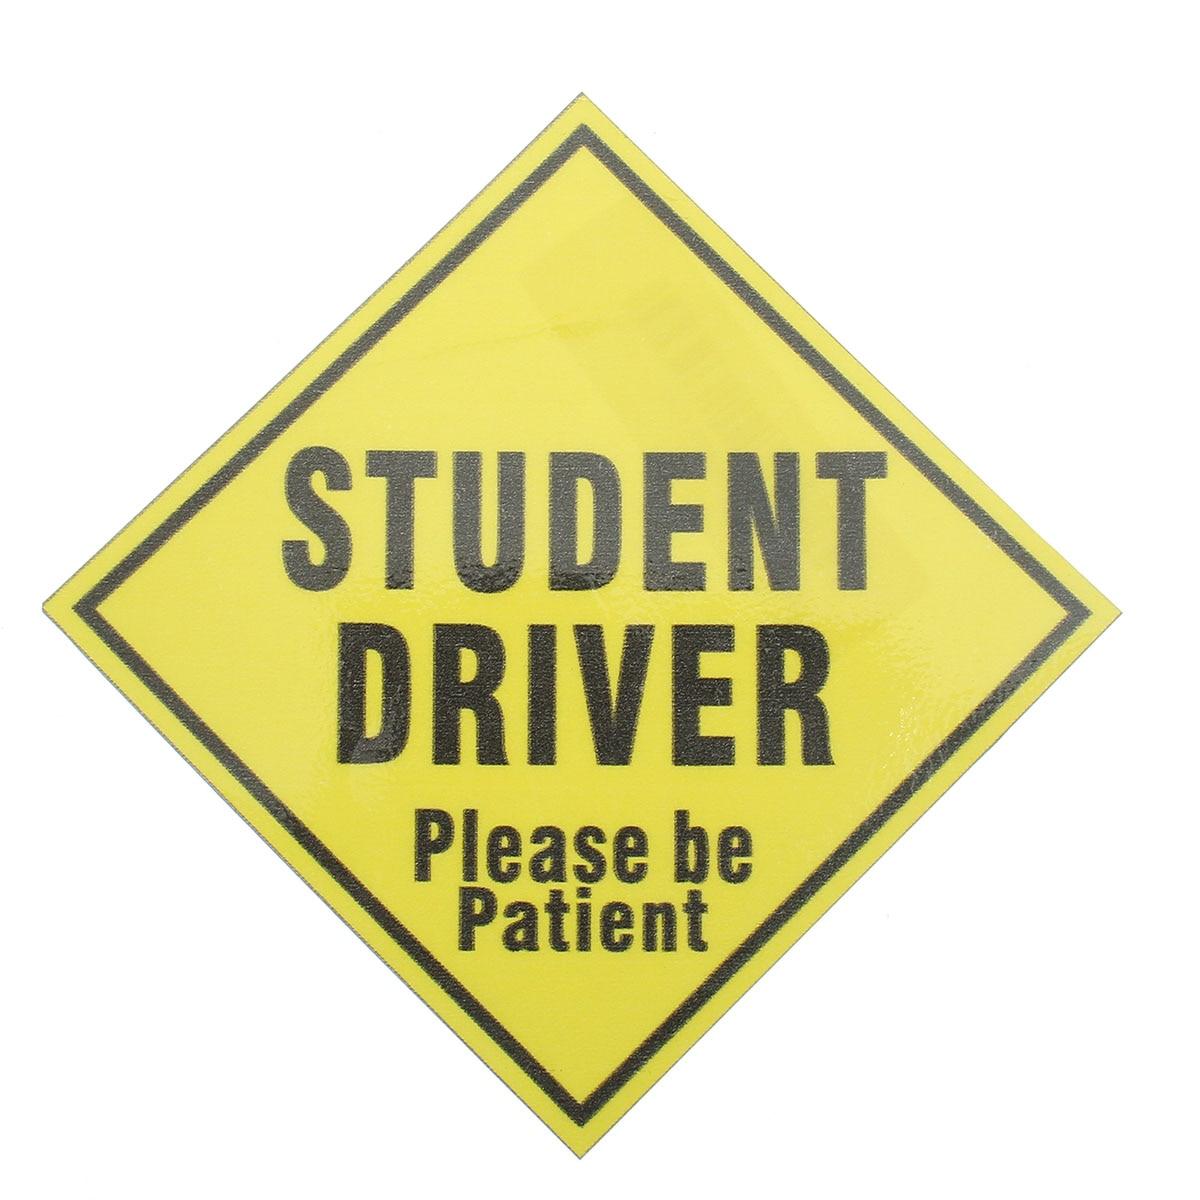 138cm X 138mm Student Driver Safety Vinyl Decal Sticker Label School Teen Yellow Waterproof Fade Resistant Scratch Resistant